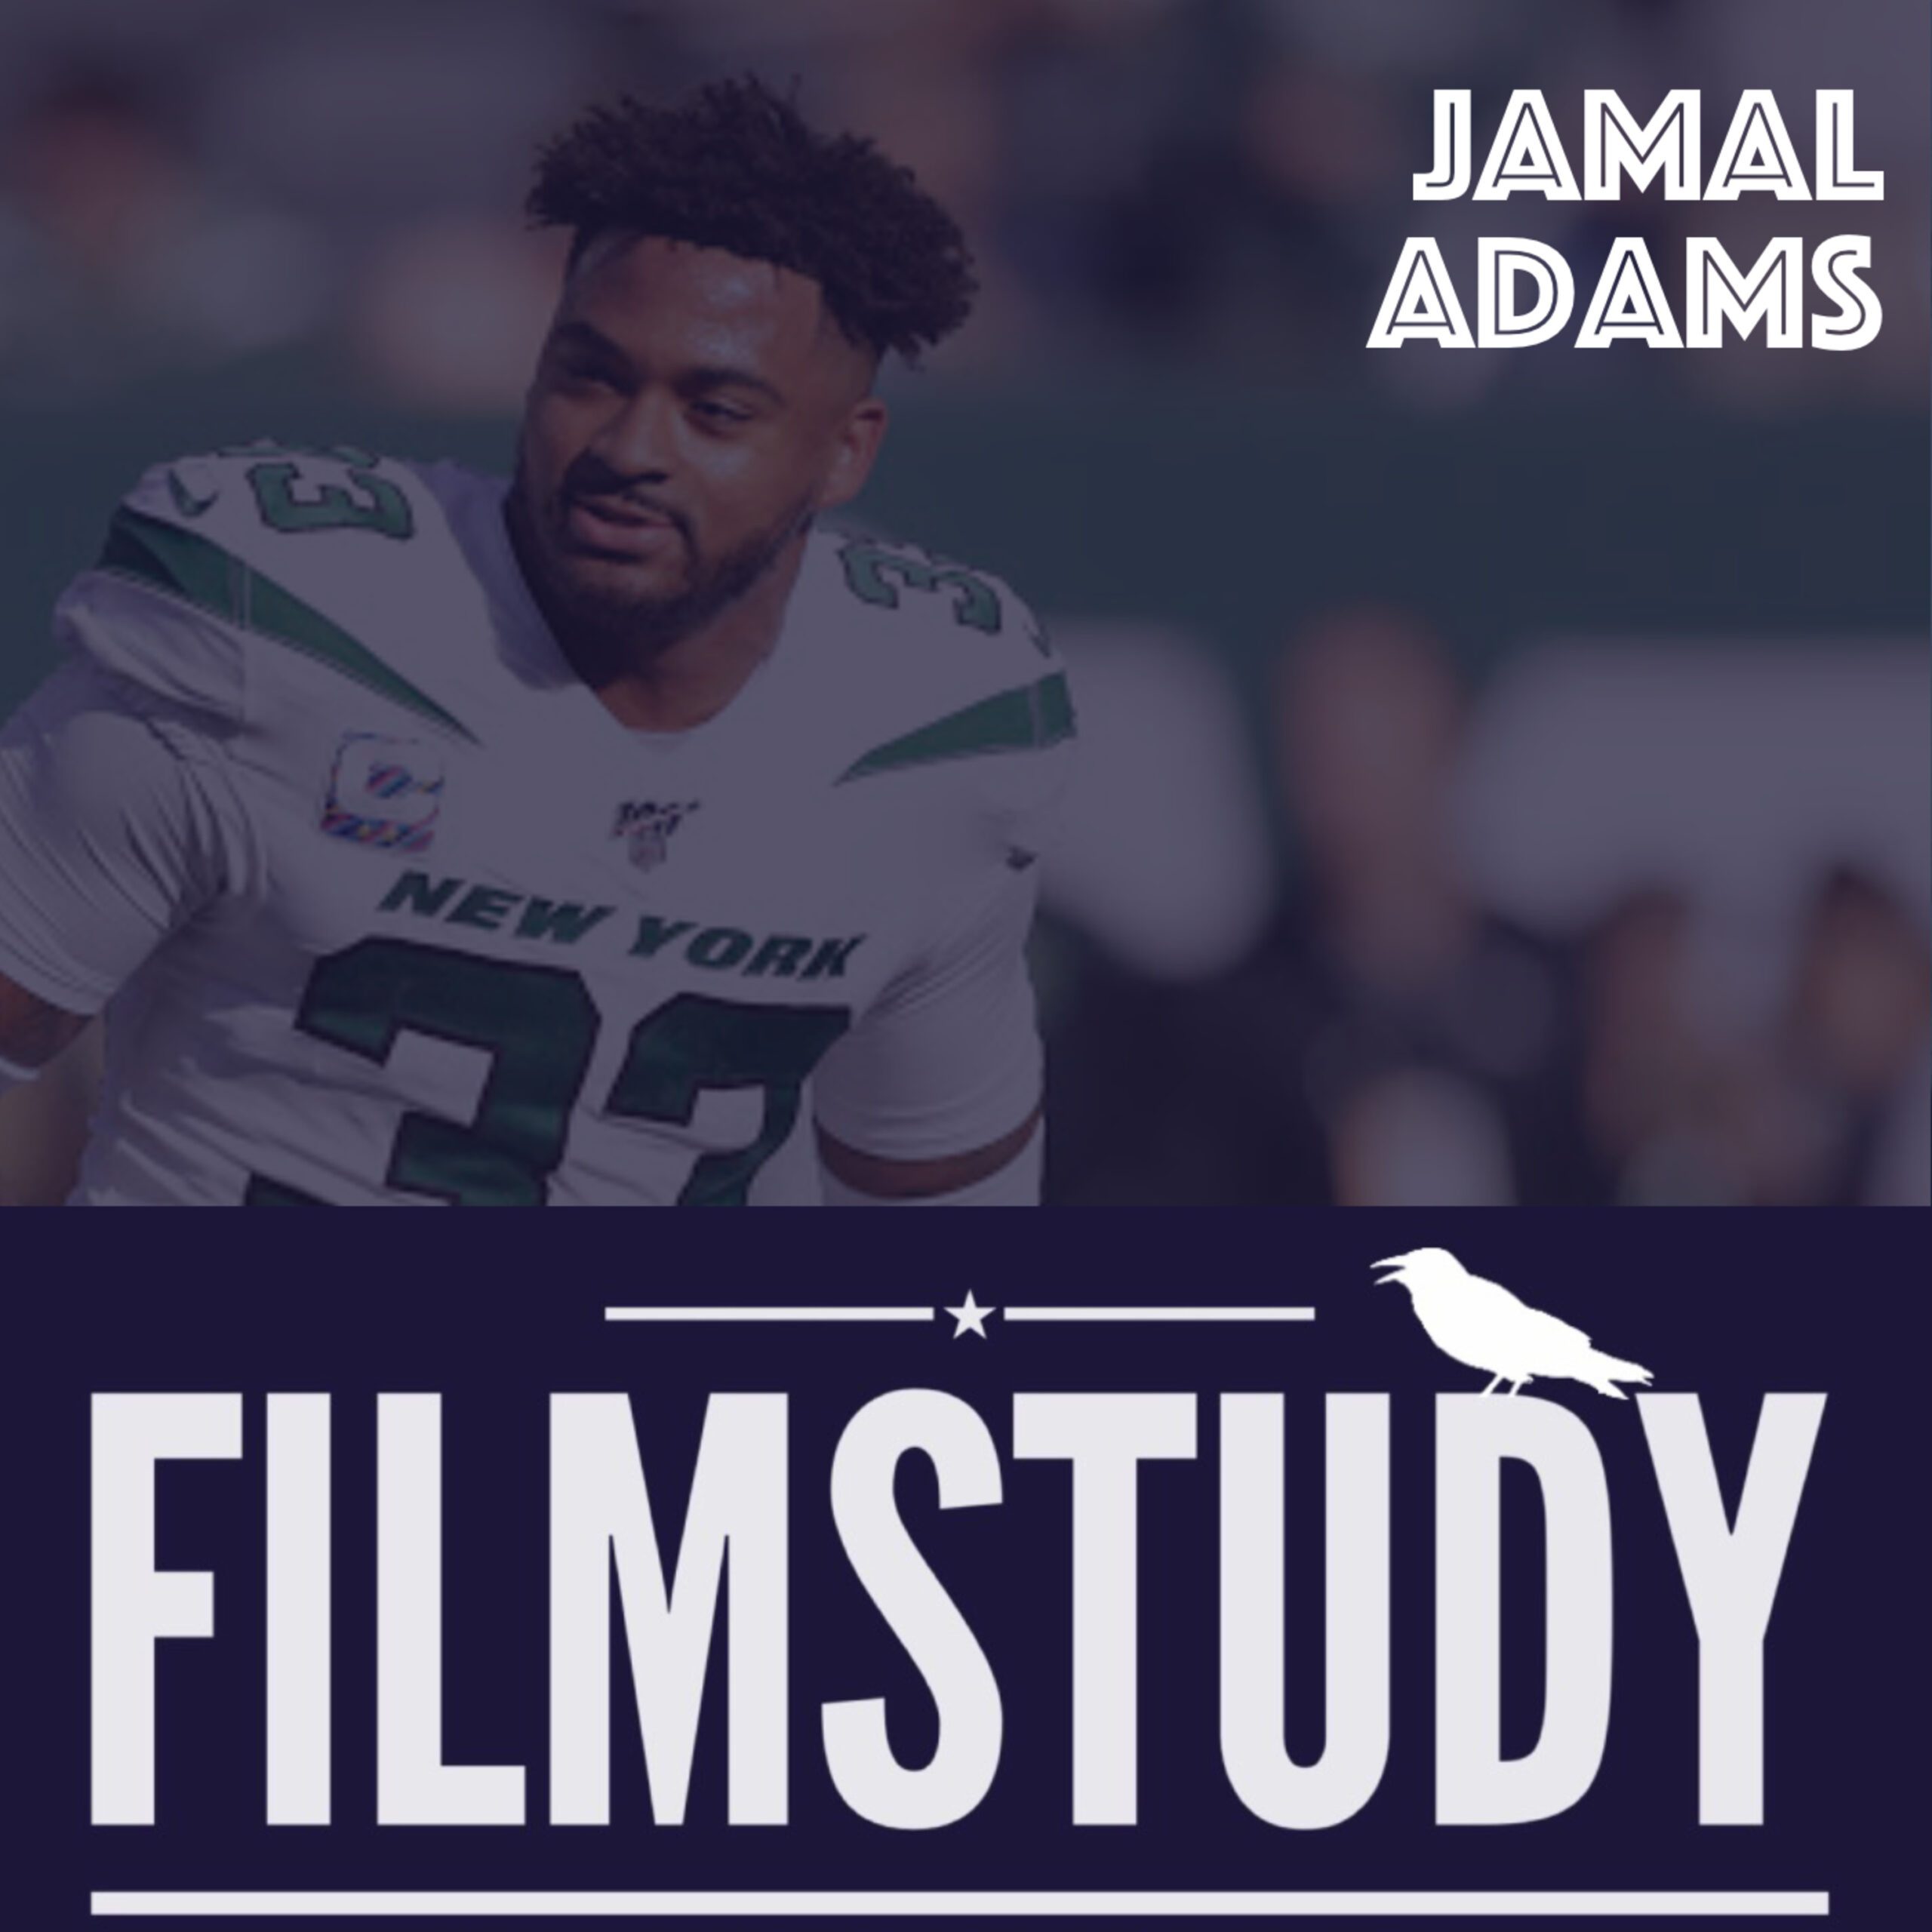 Jamal Adams Possibility